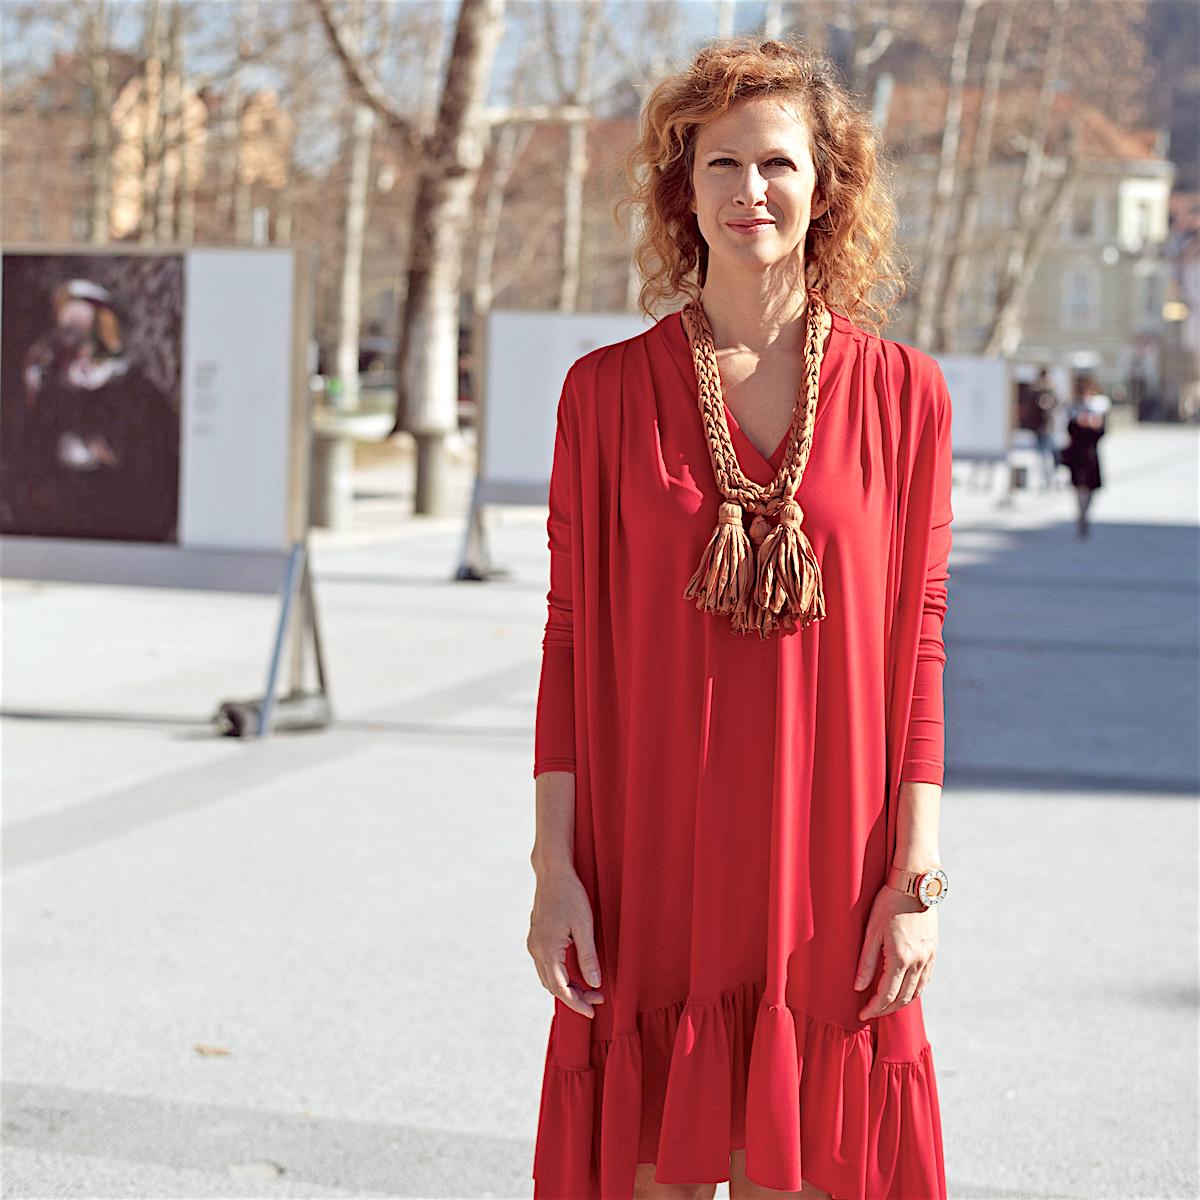 Najlepsa obleka trajnostno beautyfullblog nika veger maja stamol